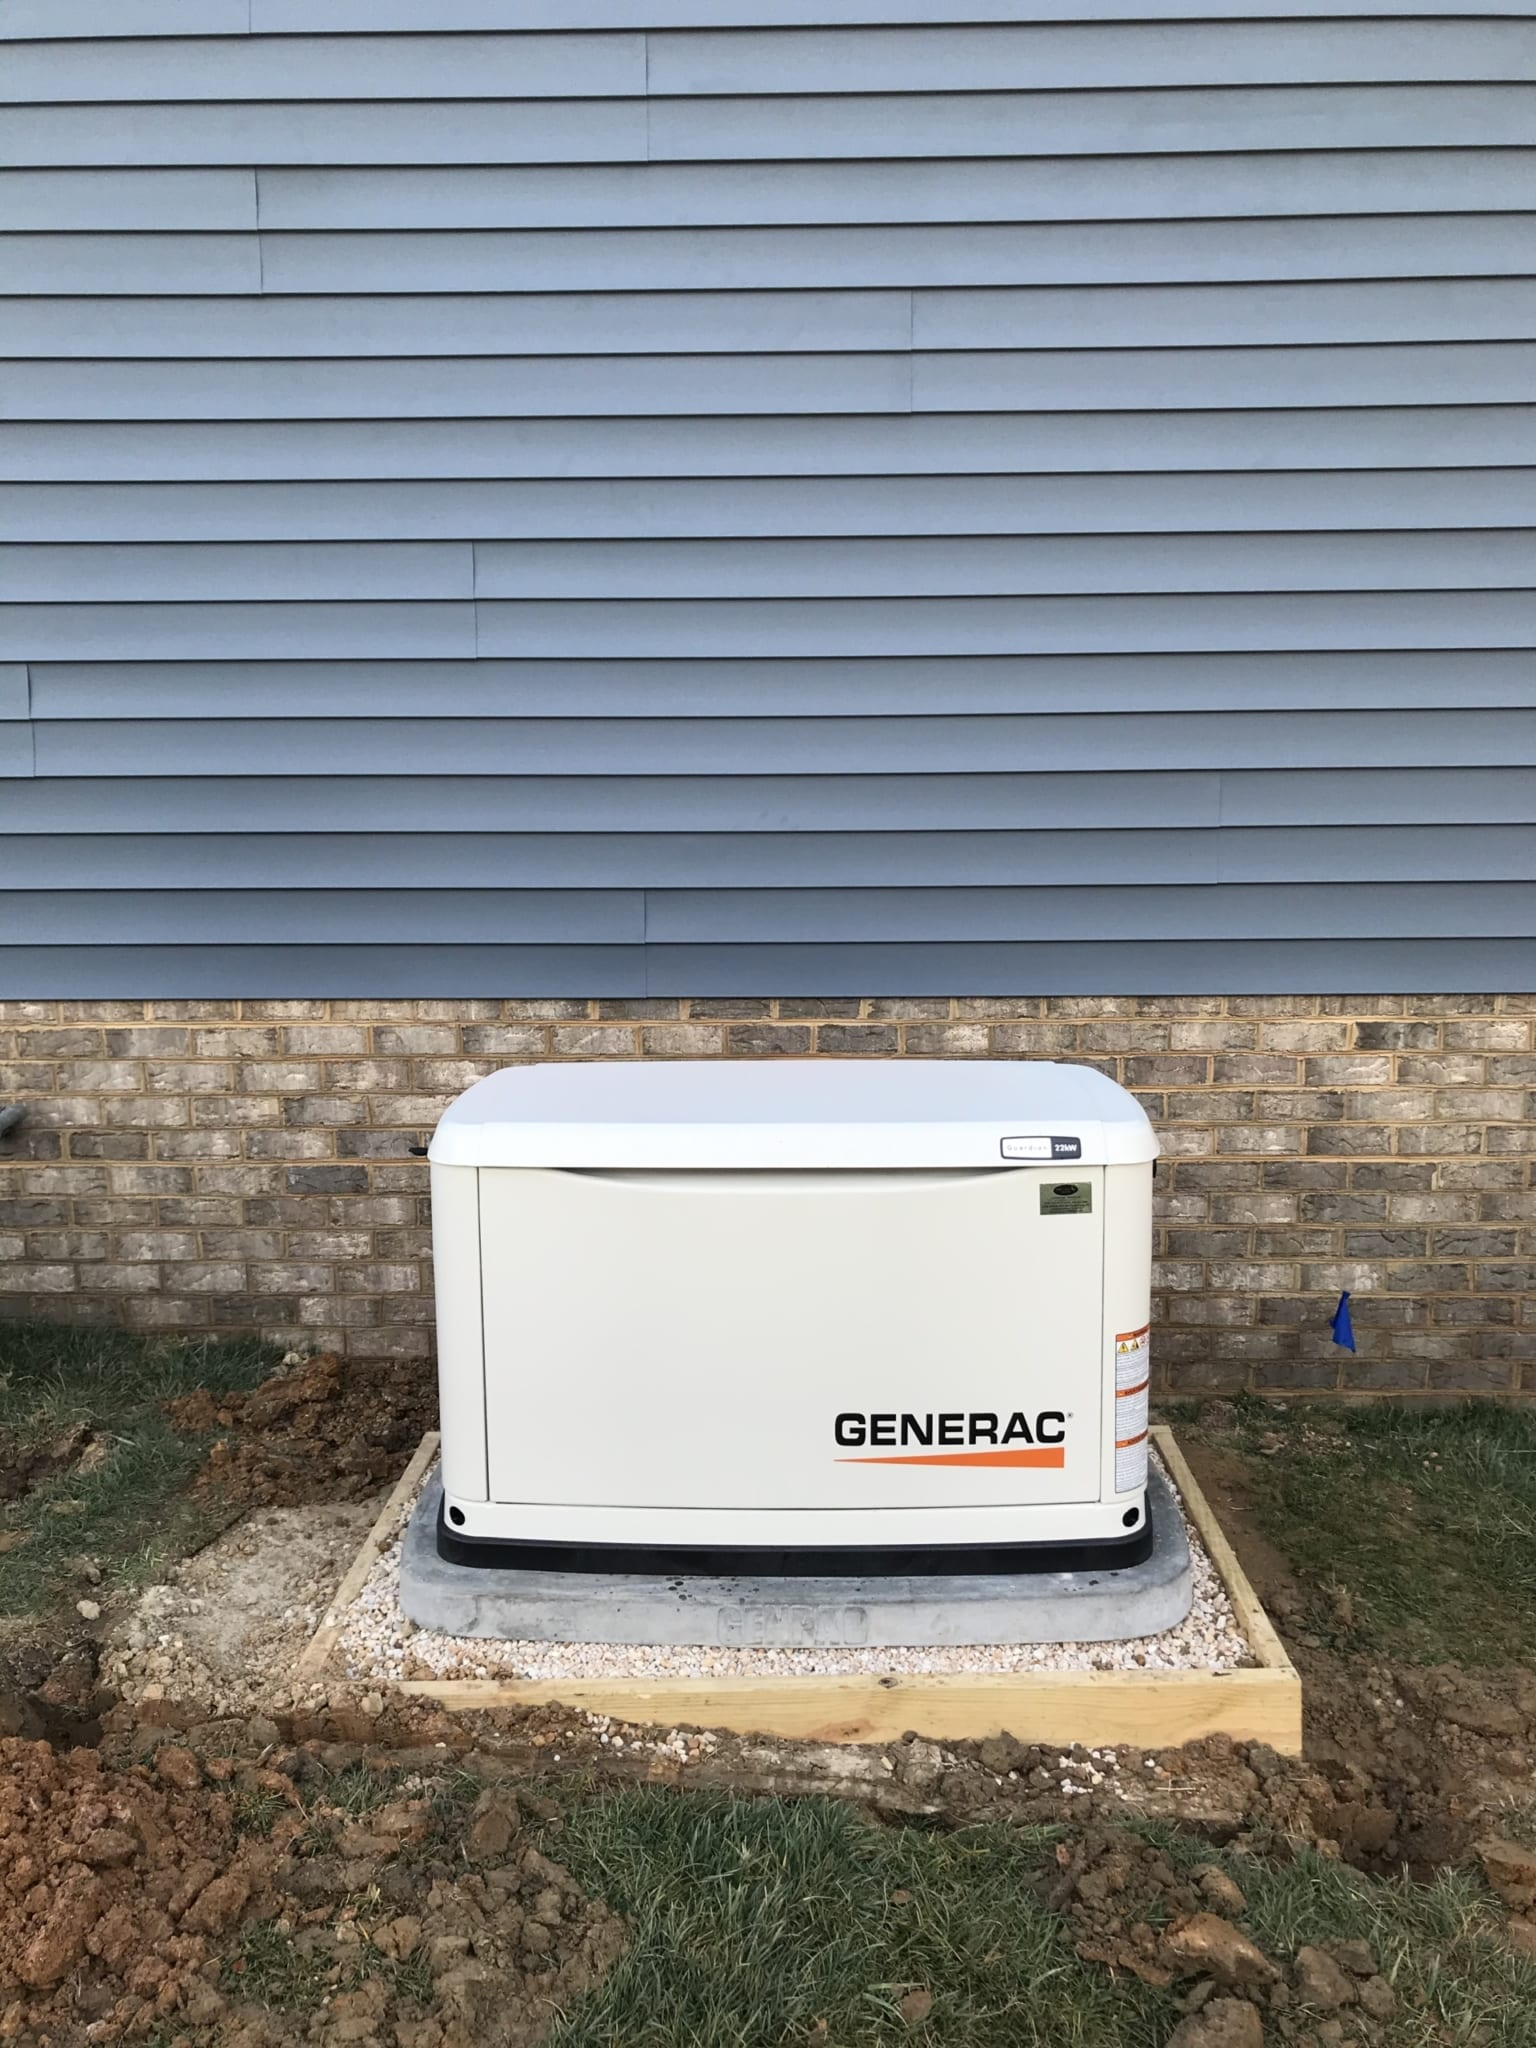 3.17.20 Chesterfield Generac Automatic Standby Generator